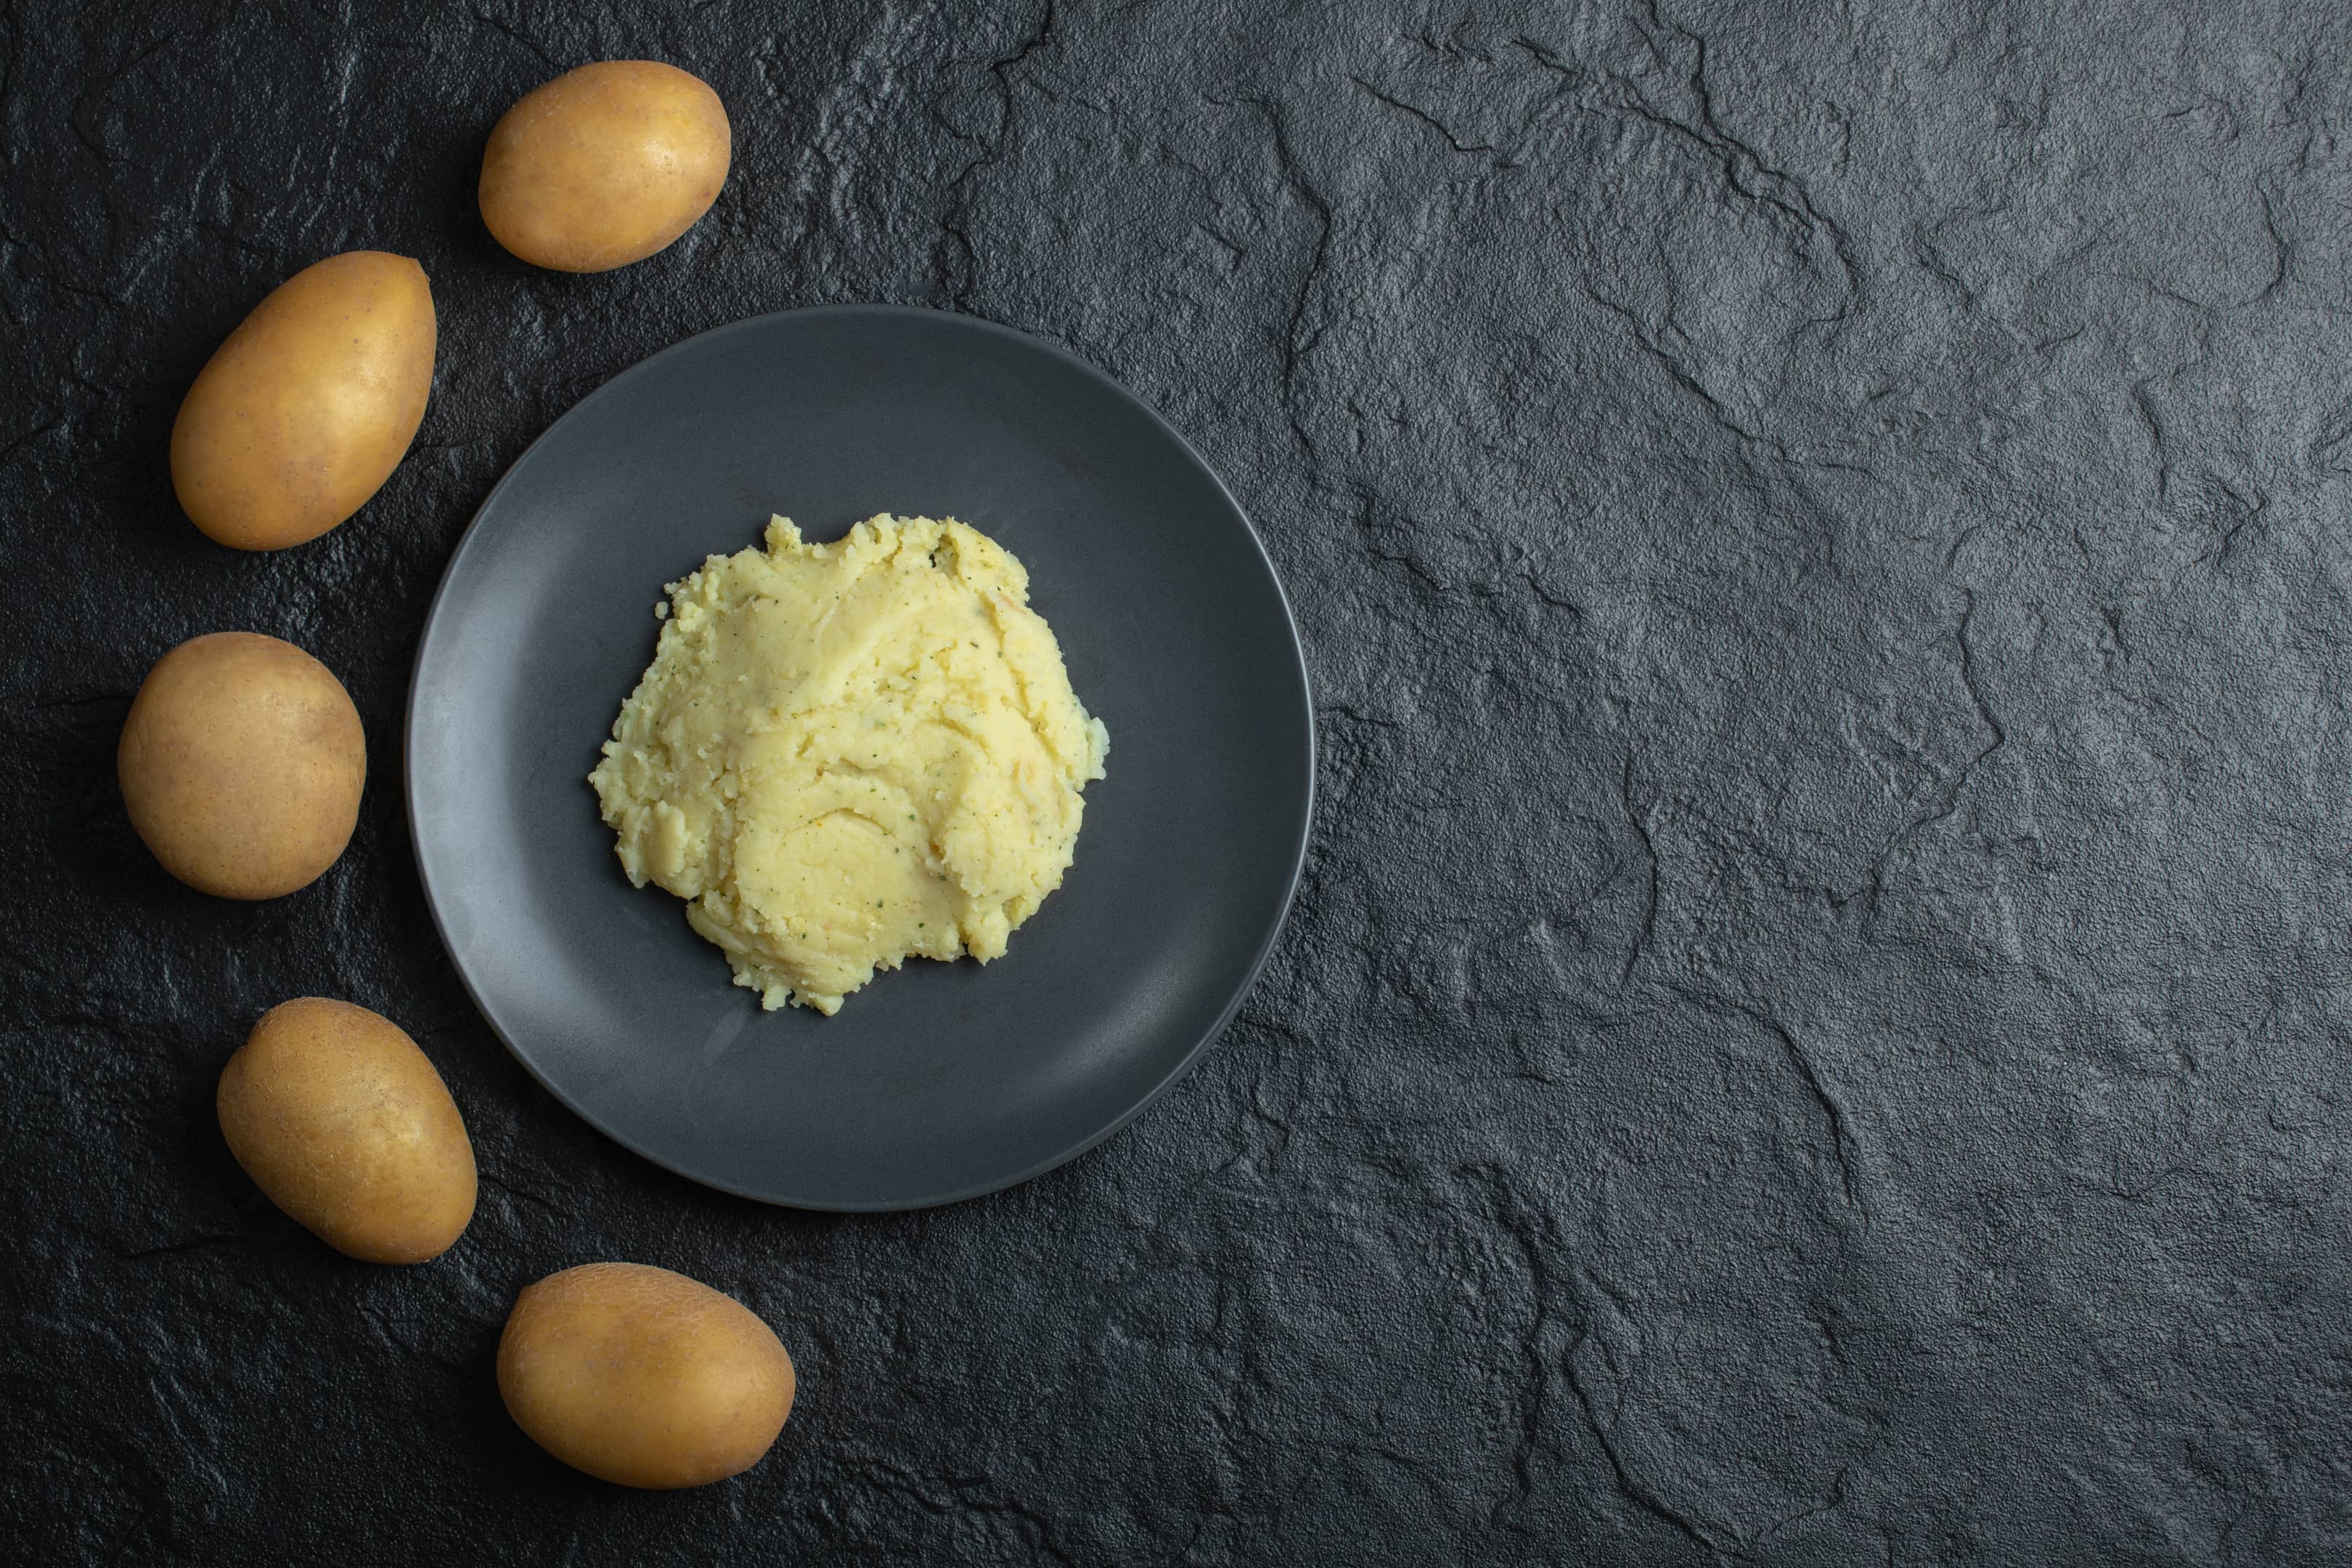 Fresh potatoes and mashed potatoes on black table